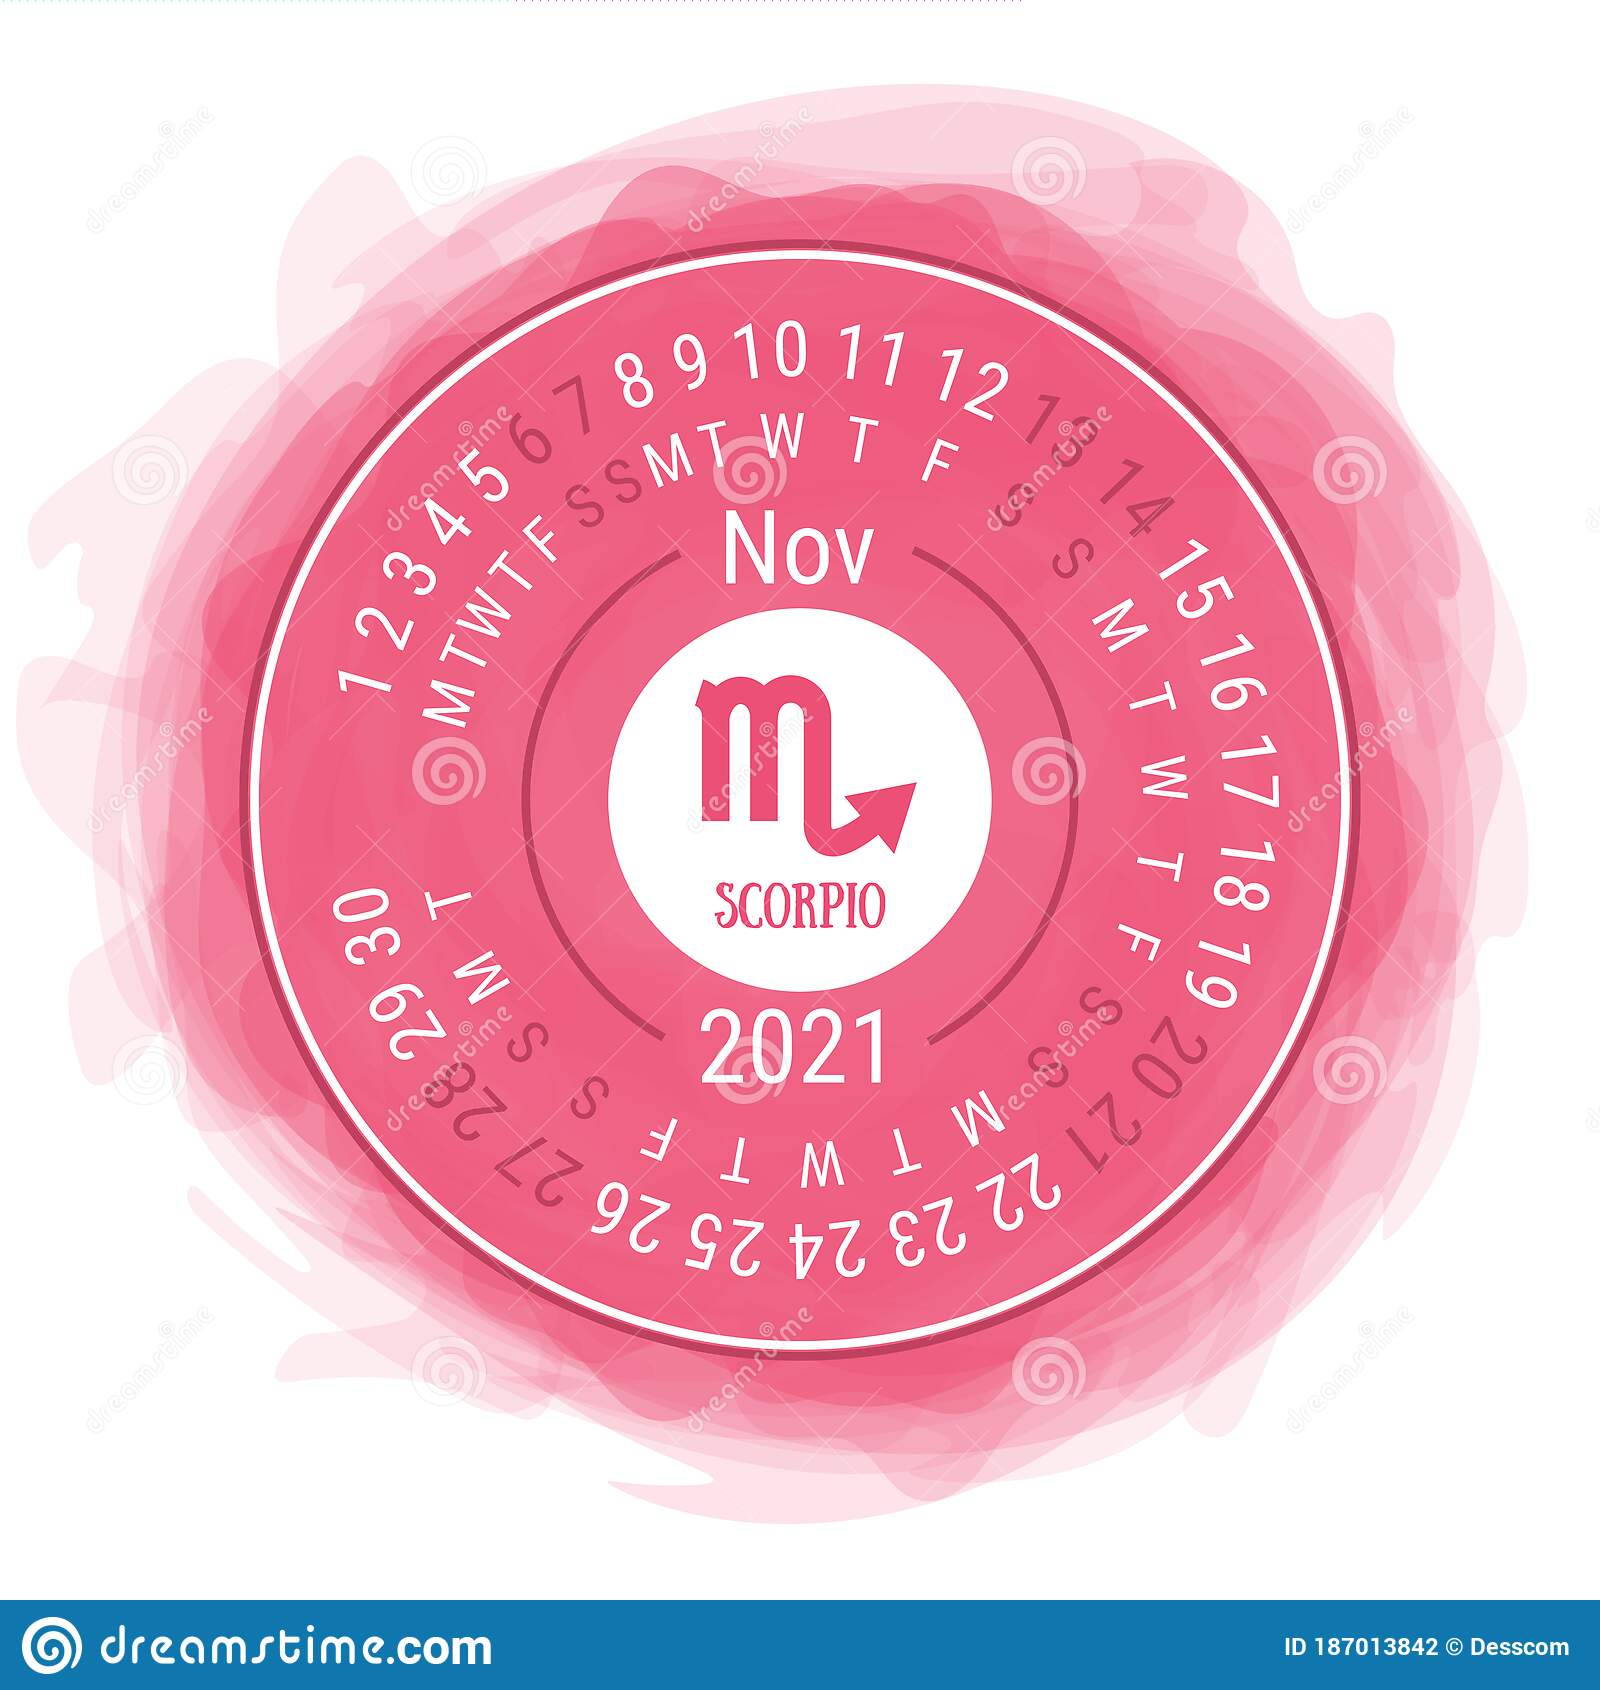 Scorpio horoscope november 2021